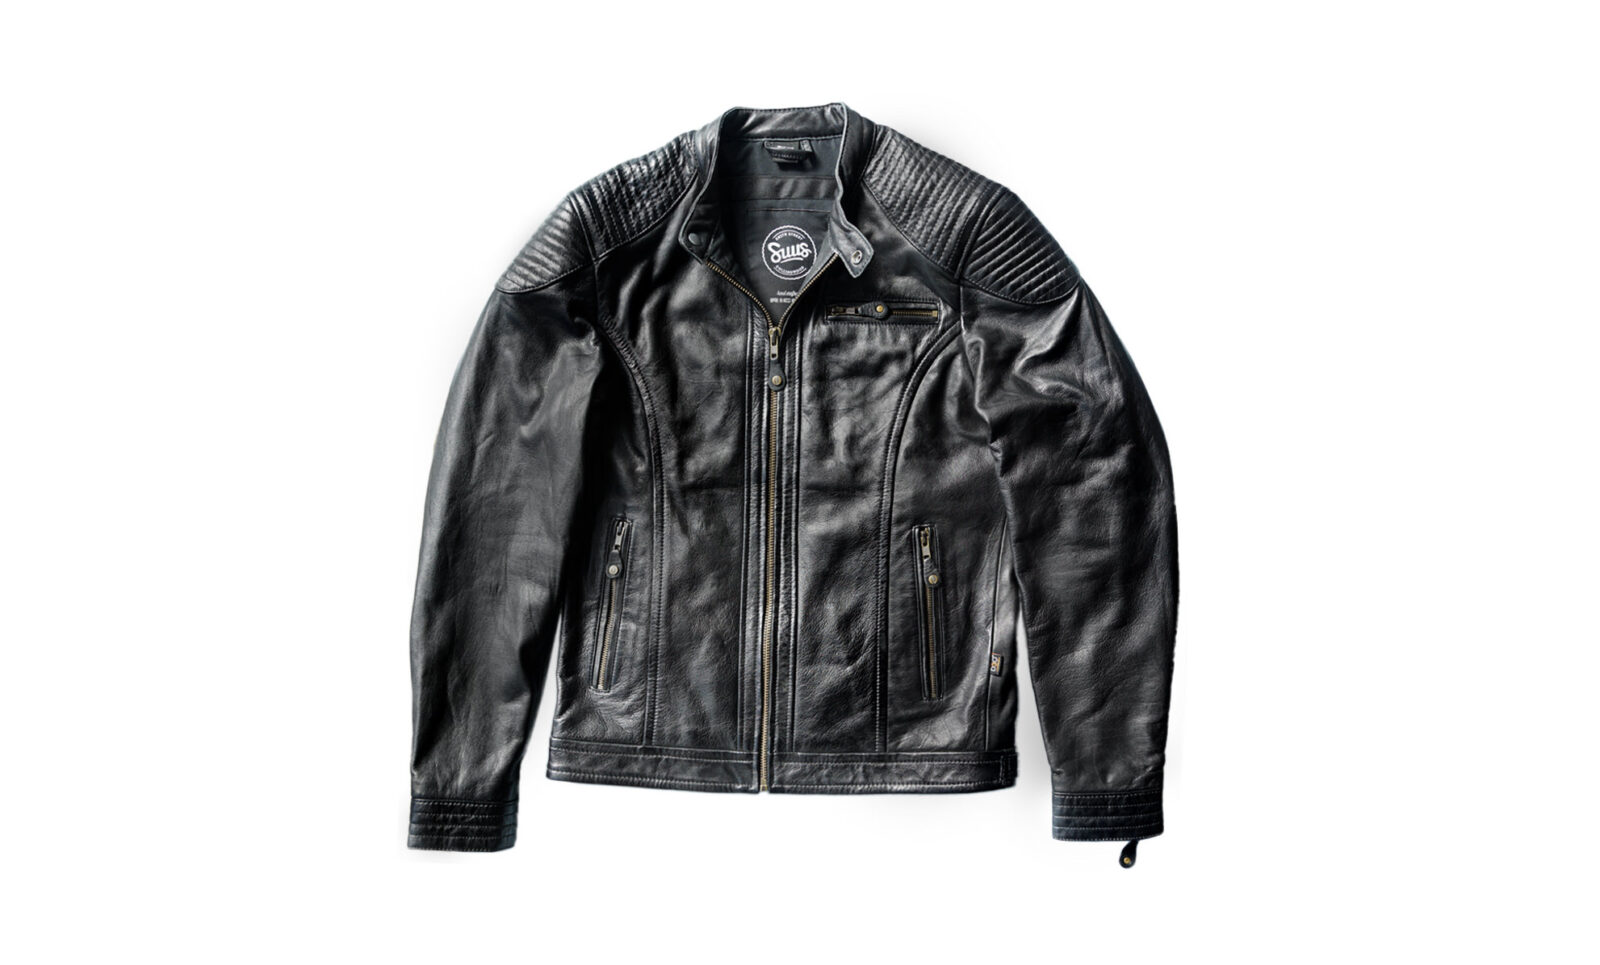 Smith Leather Motorcycle Jacket 1600x965